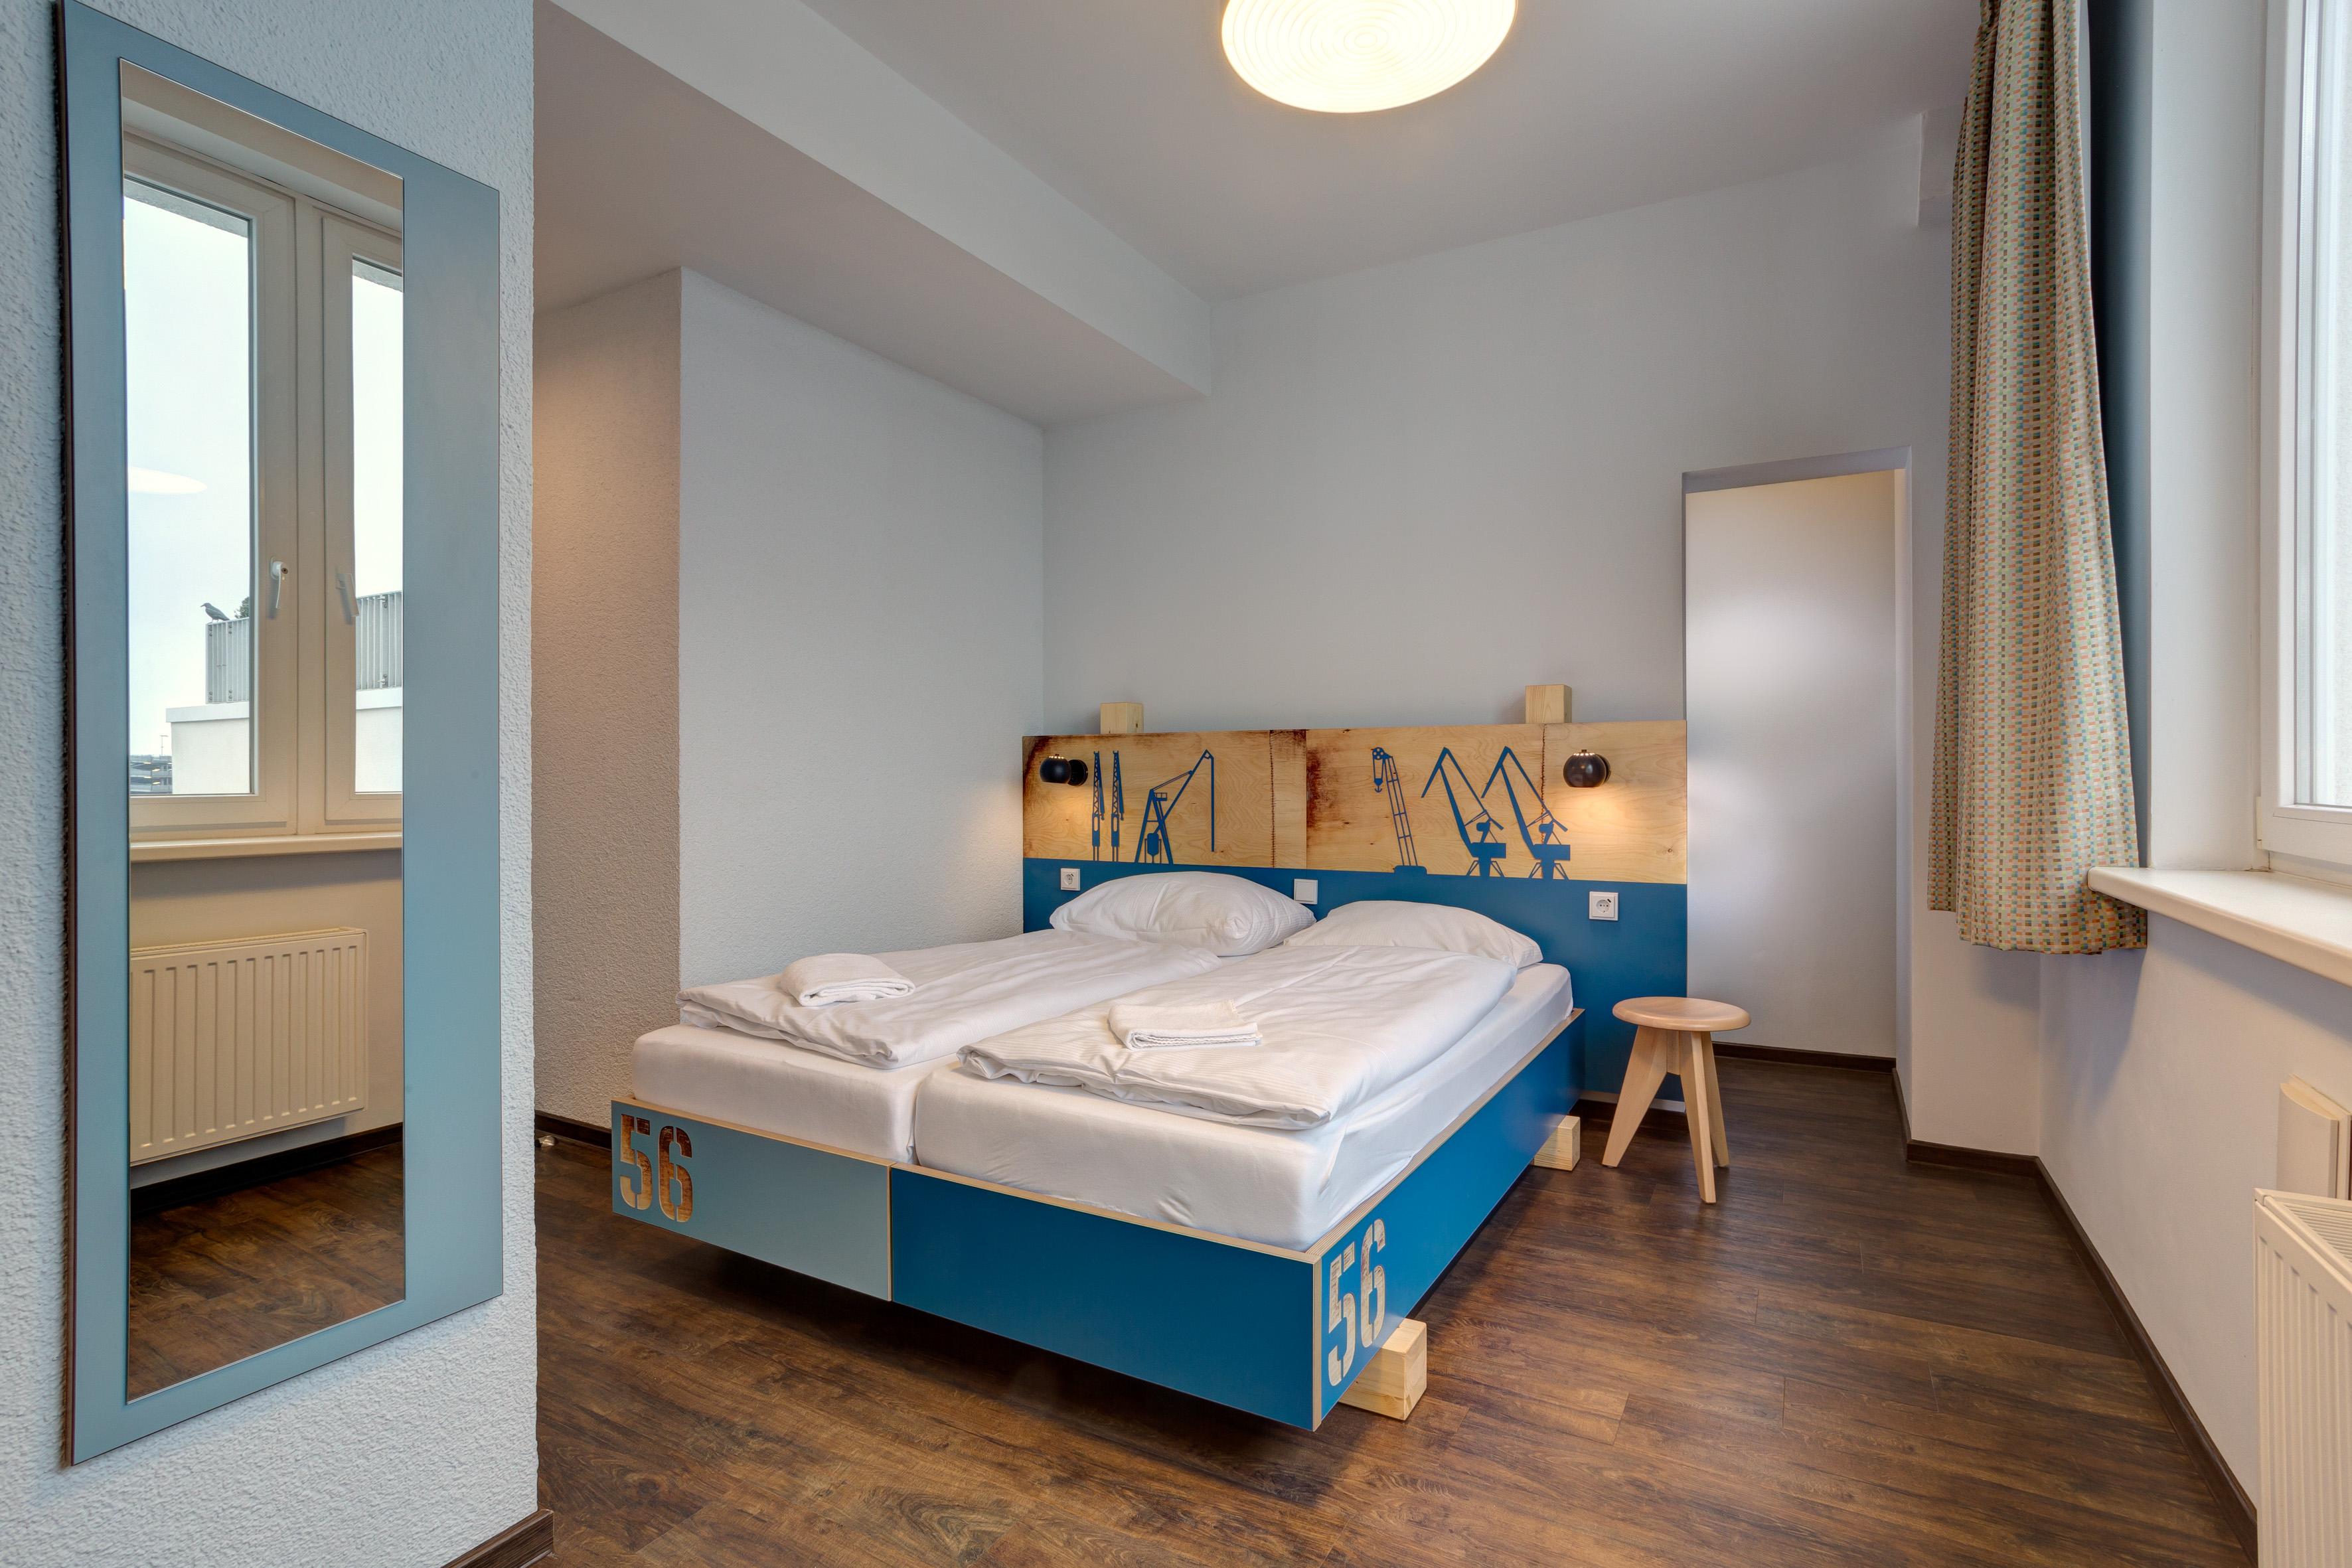 MEININGER Hotel Hamburg City Center - Habitación individual/doble